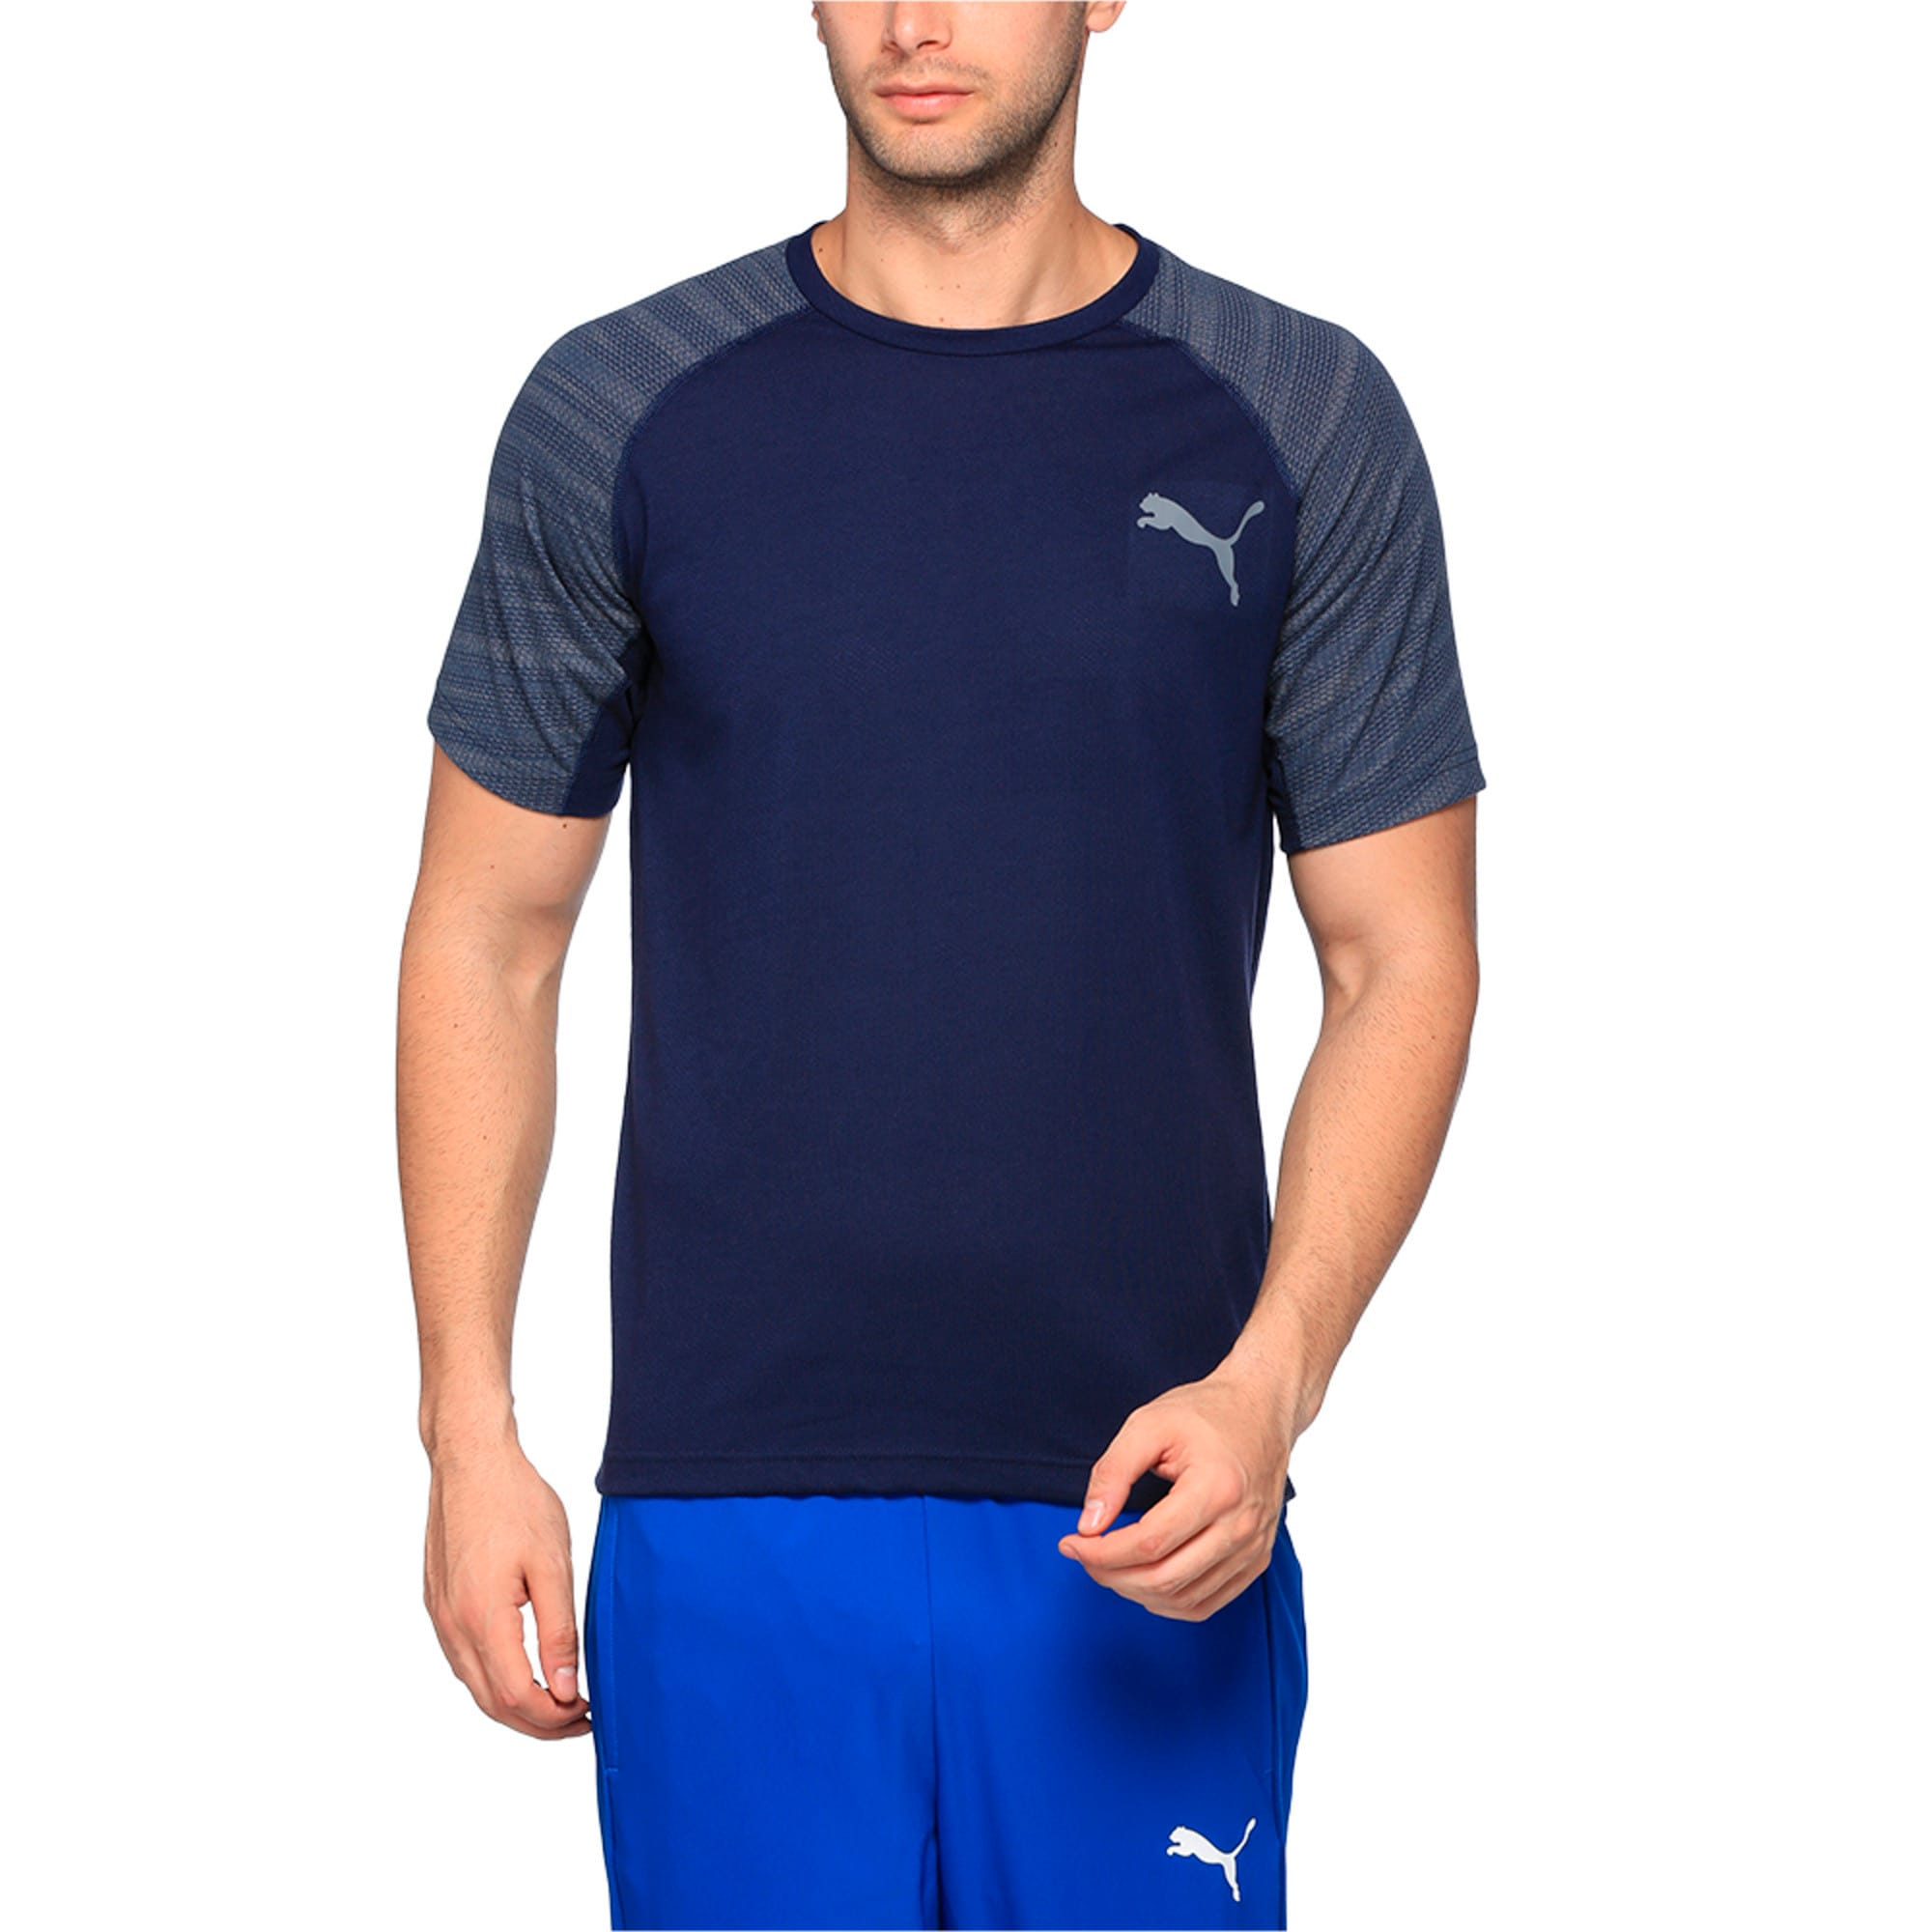 Thumbnail 1 of Active Training Dri-Release® T-Shirt, Peacoat, medium-IND